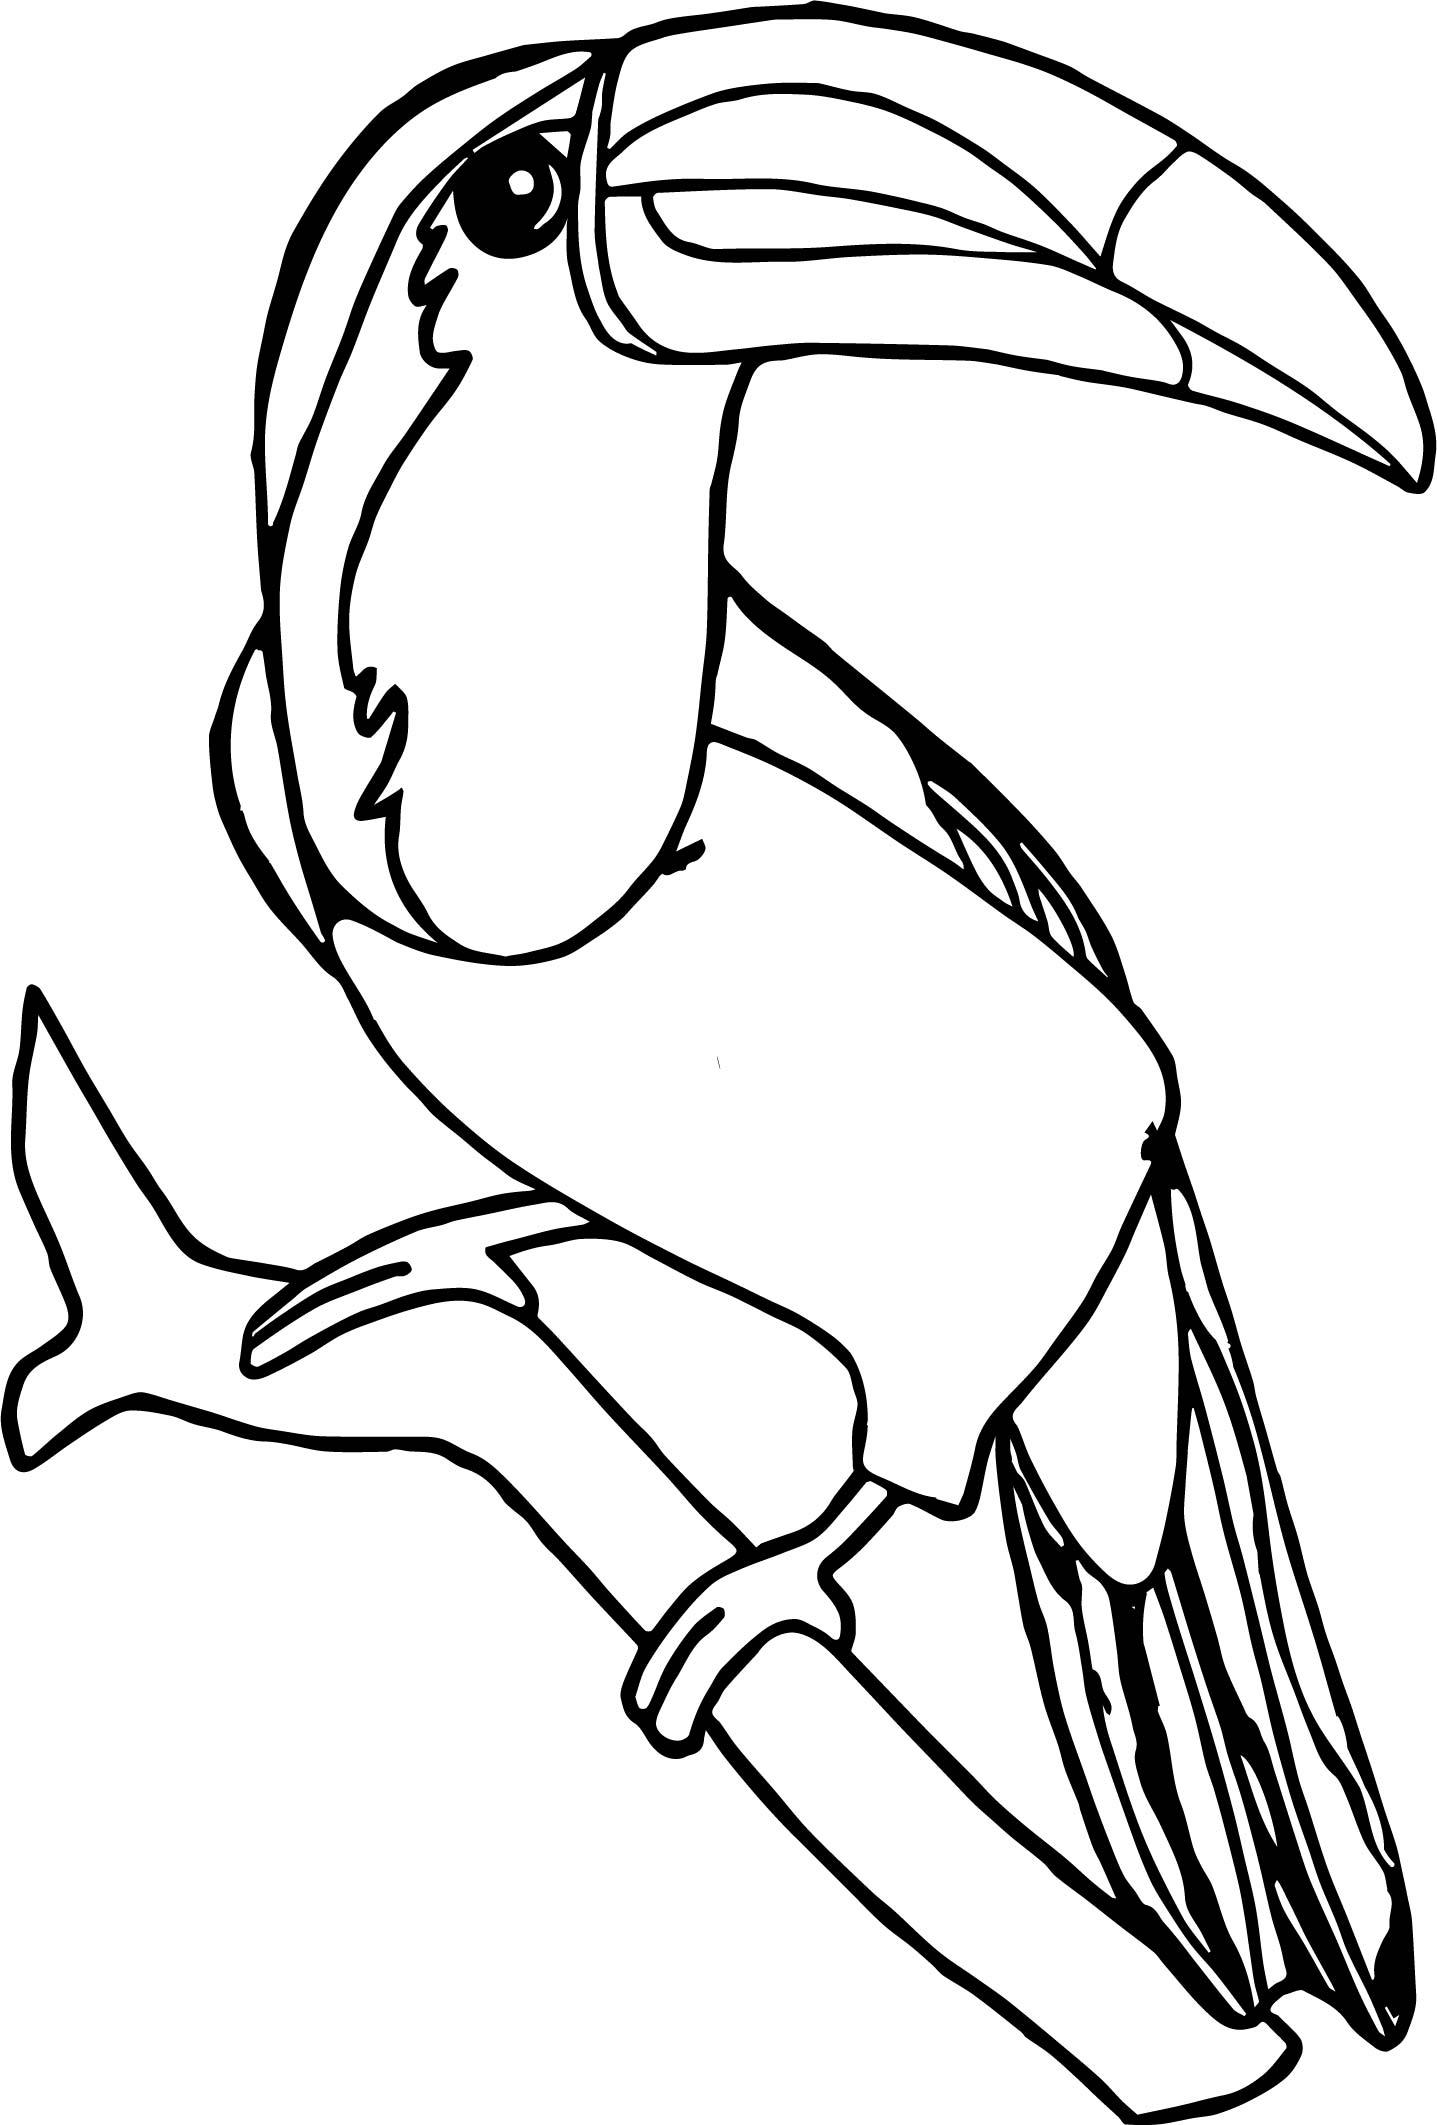 Rainforest Toucan Bird Coloring Page